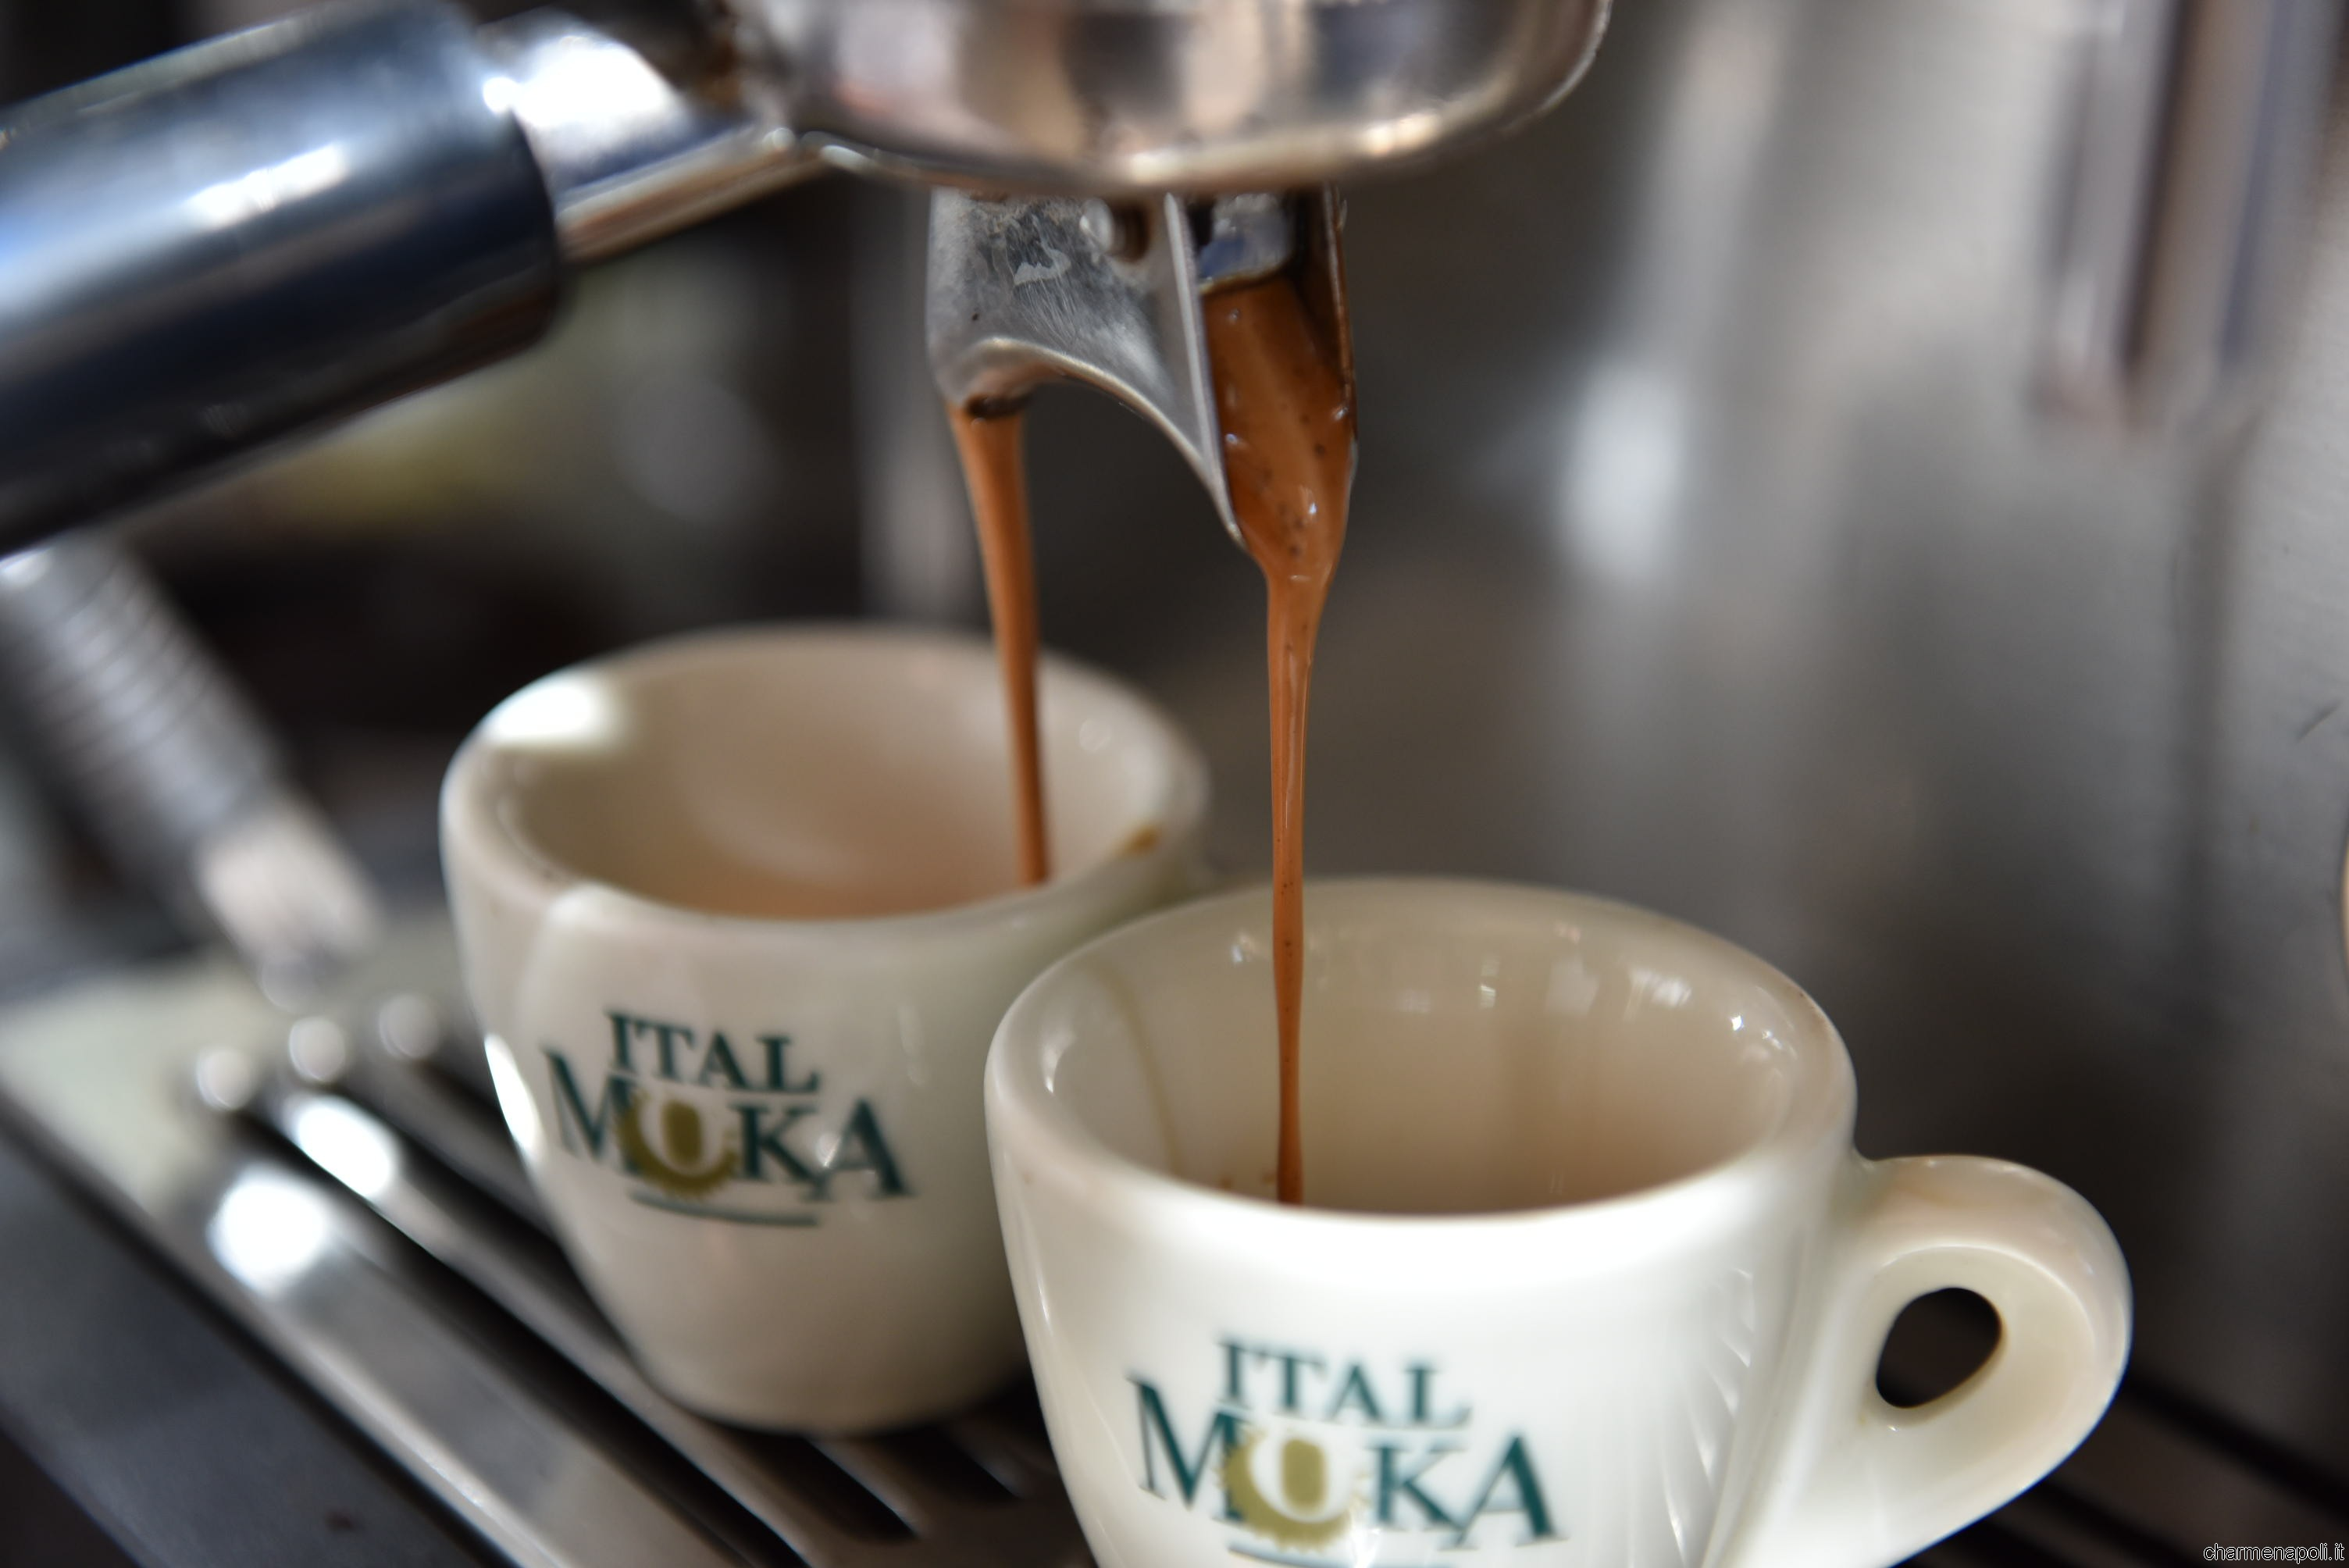 artigiani caffè napoletano - italmoka